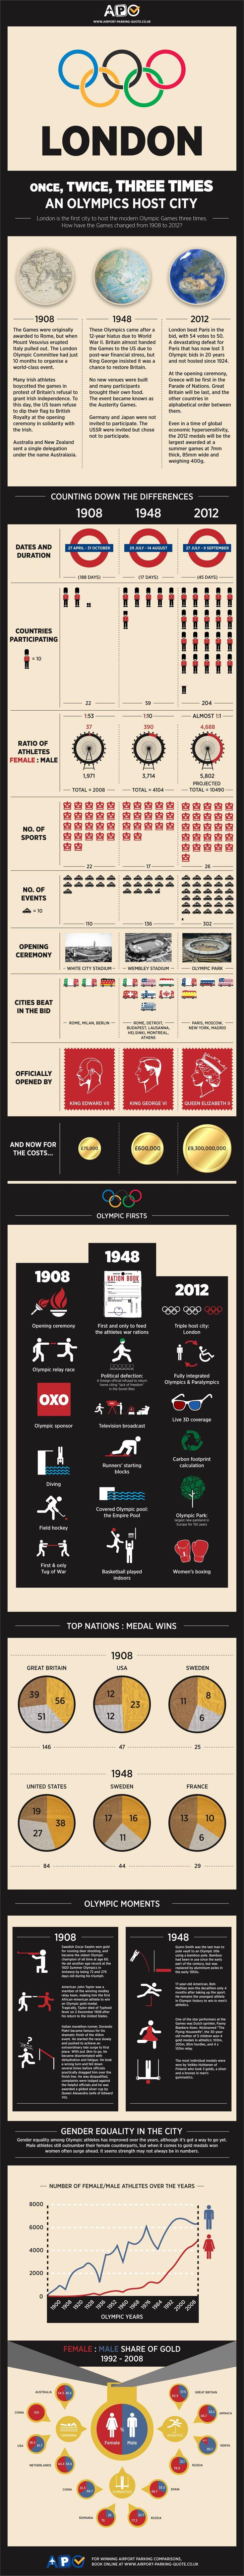 London Olympics 2012 Infographic